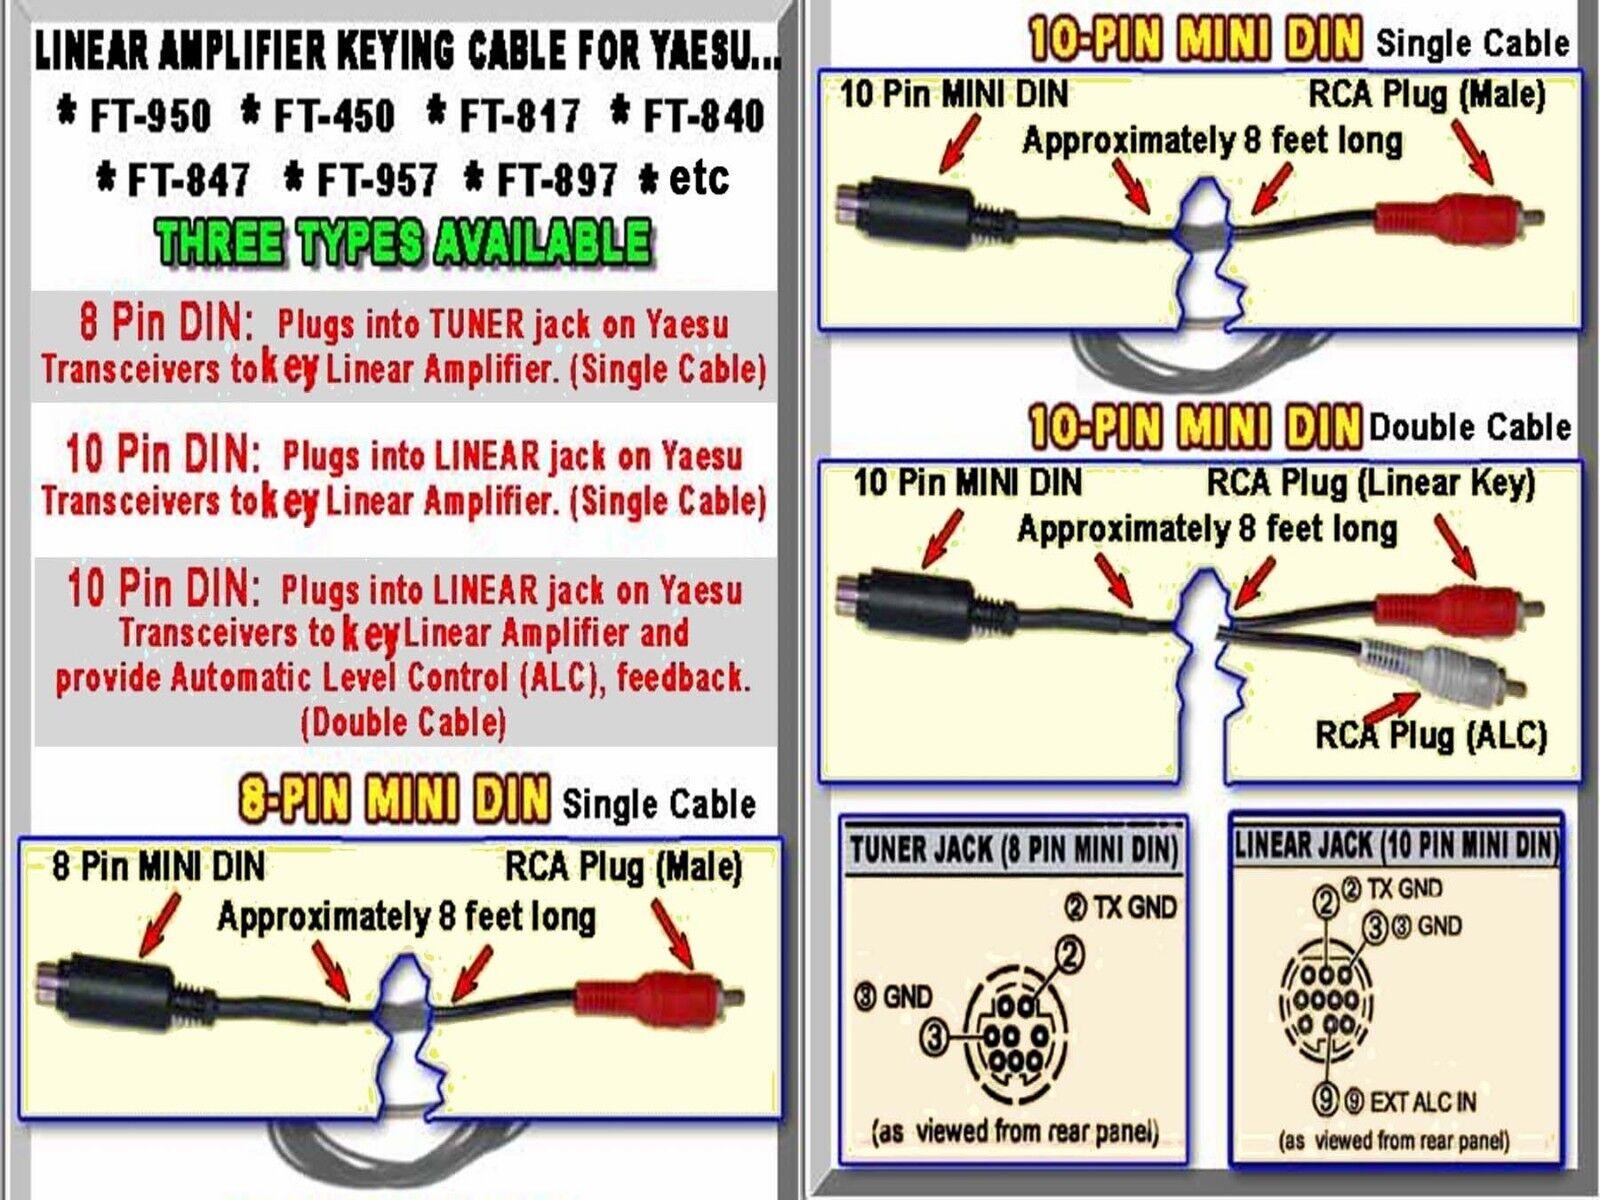 D 8-PIN MINI-DIN KEYING CABLE YAESU FT-950 D FT-DX1200 FT-817 FT-847 /&? FT-450